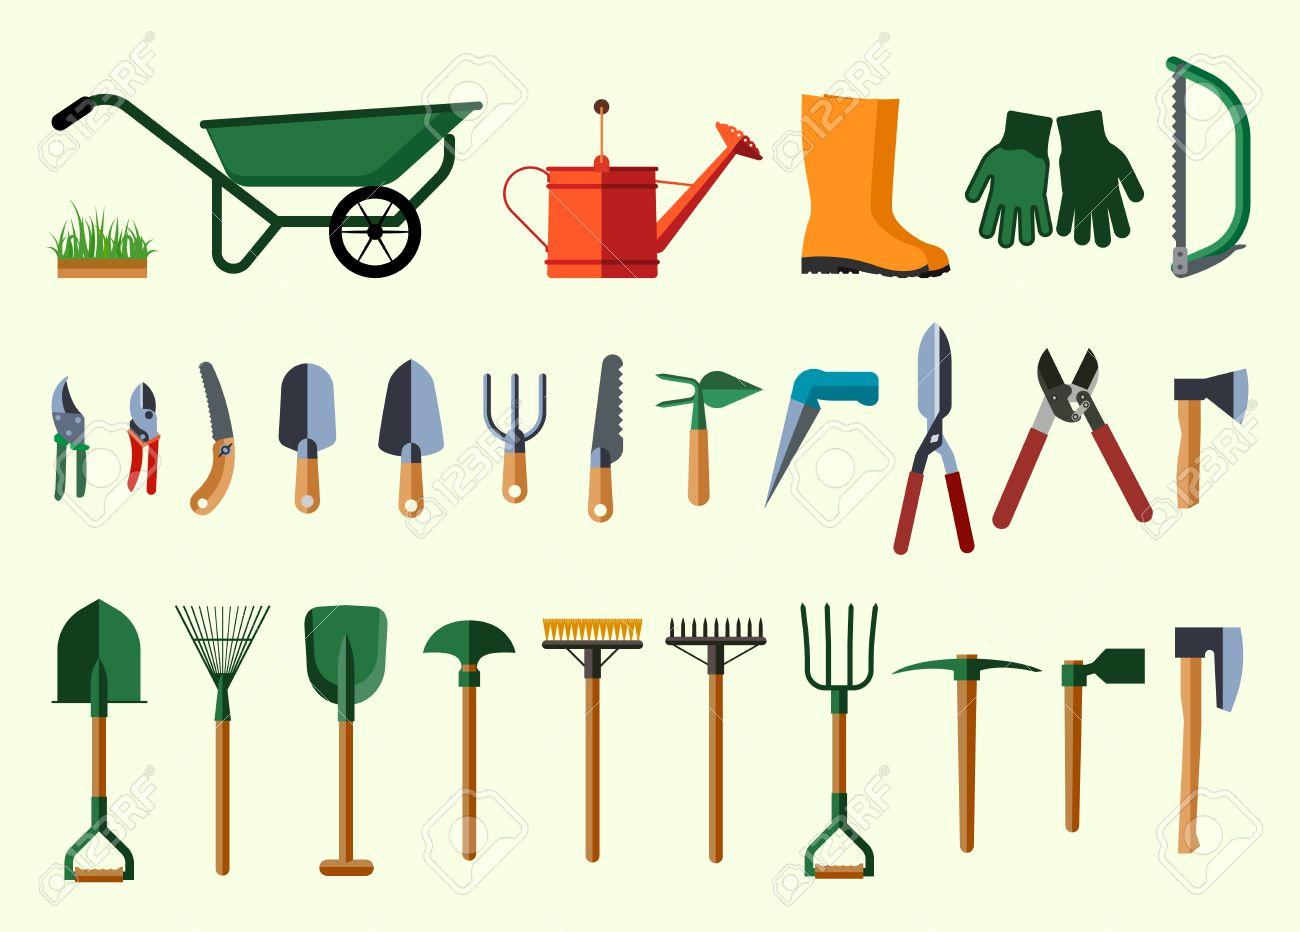 Find The Best Garden Tools